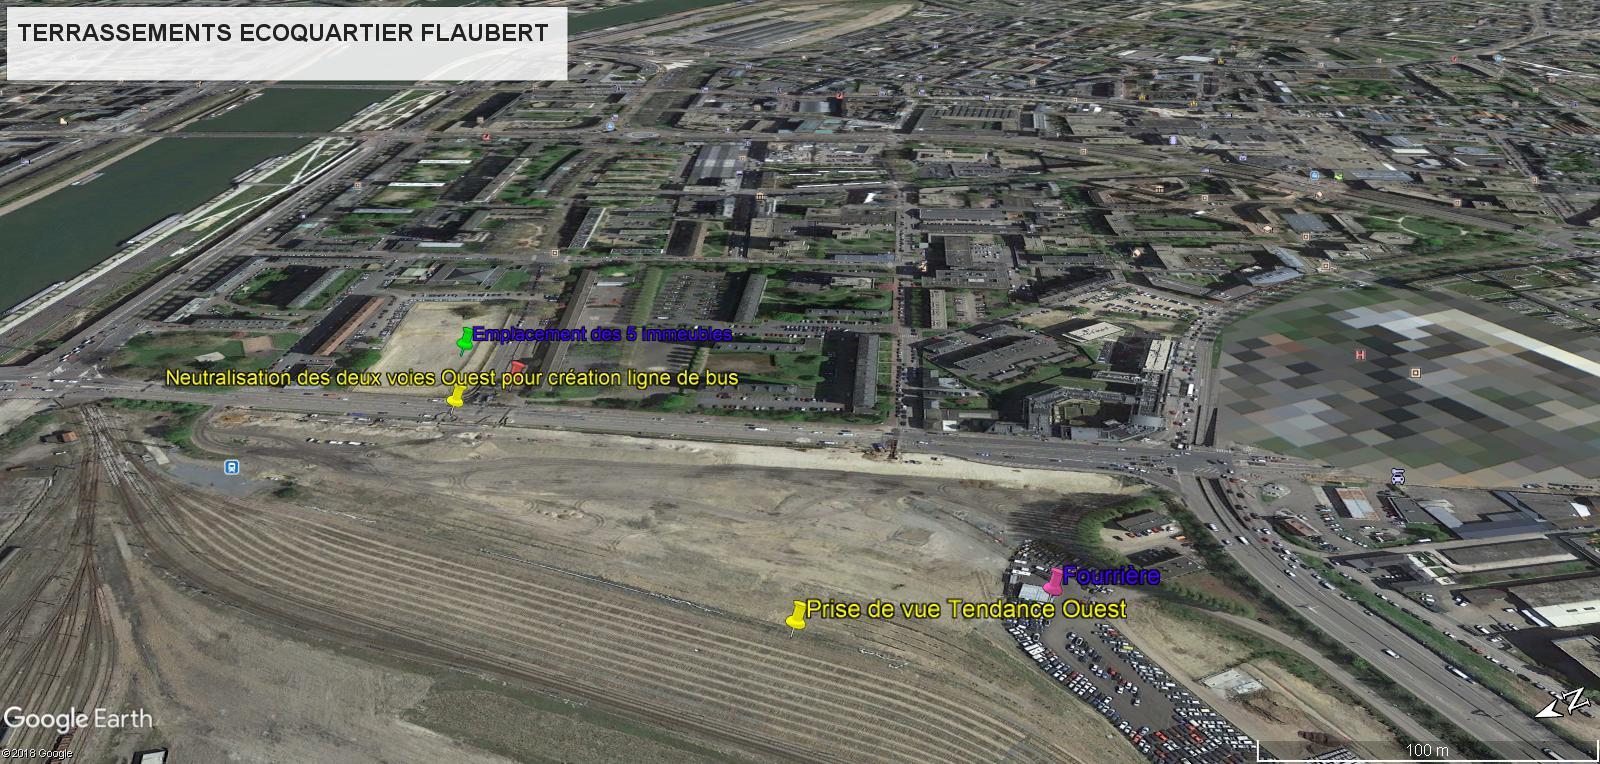 [Bientôt visible sur Google Earth] - Rouen - Ecoquartier Flaubert Flaub10